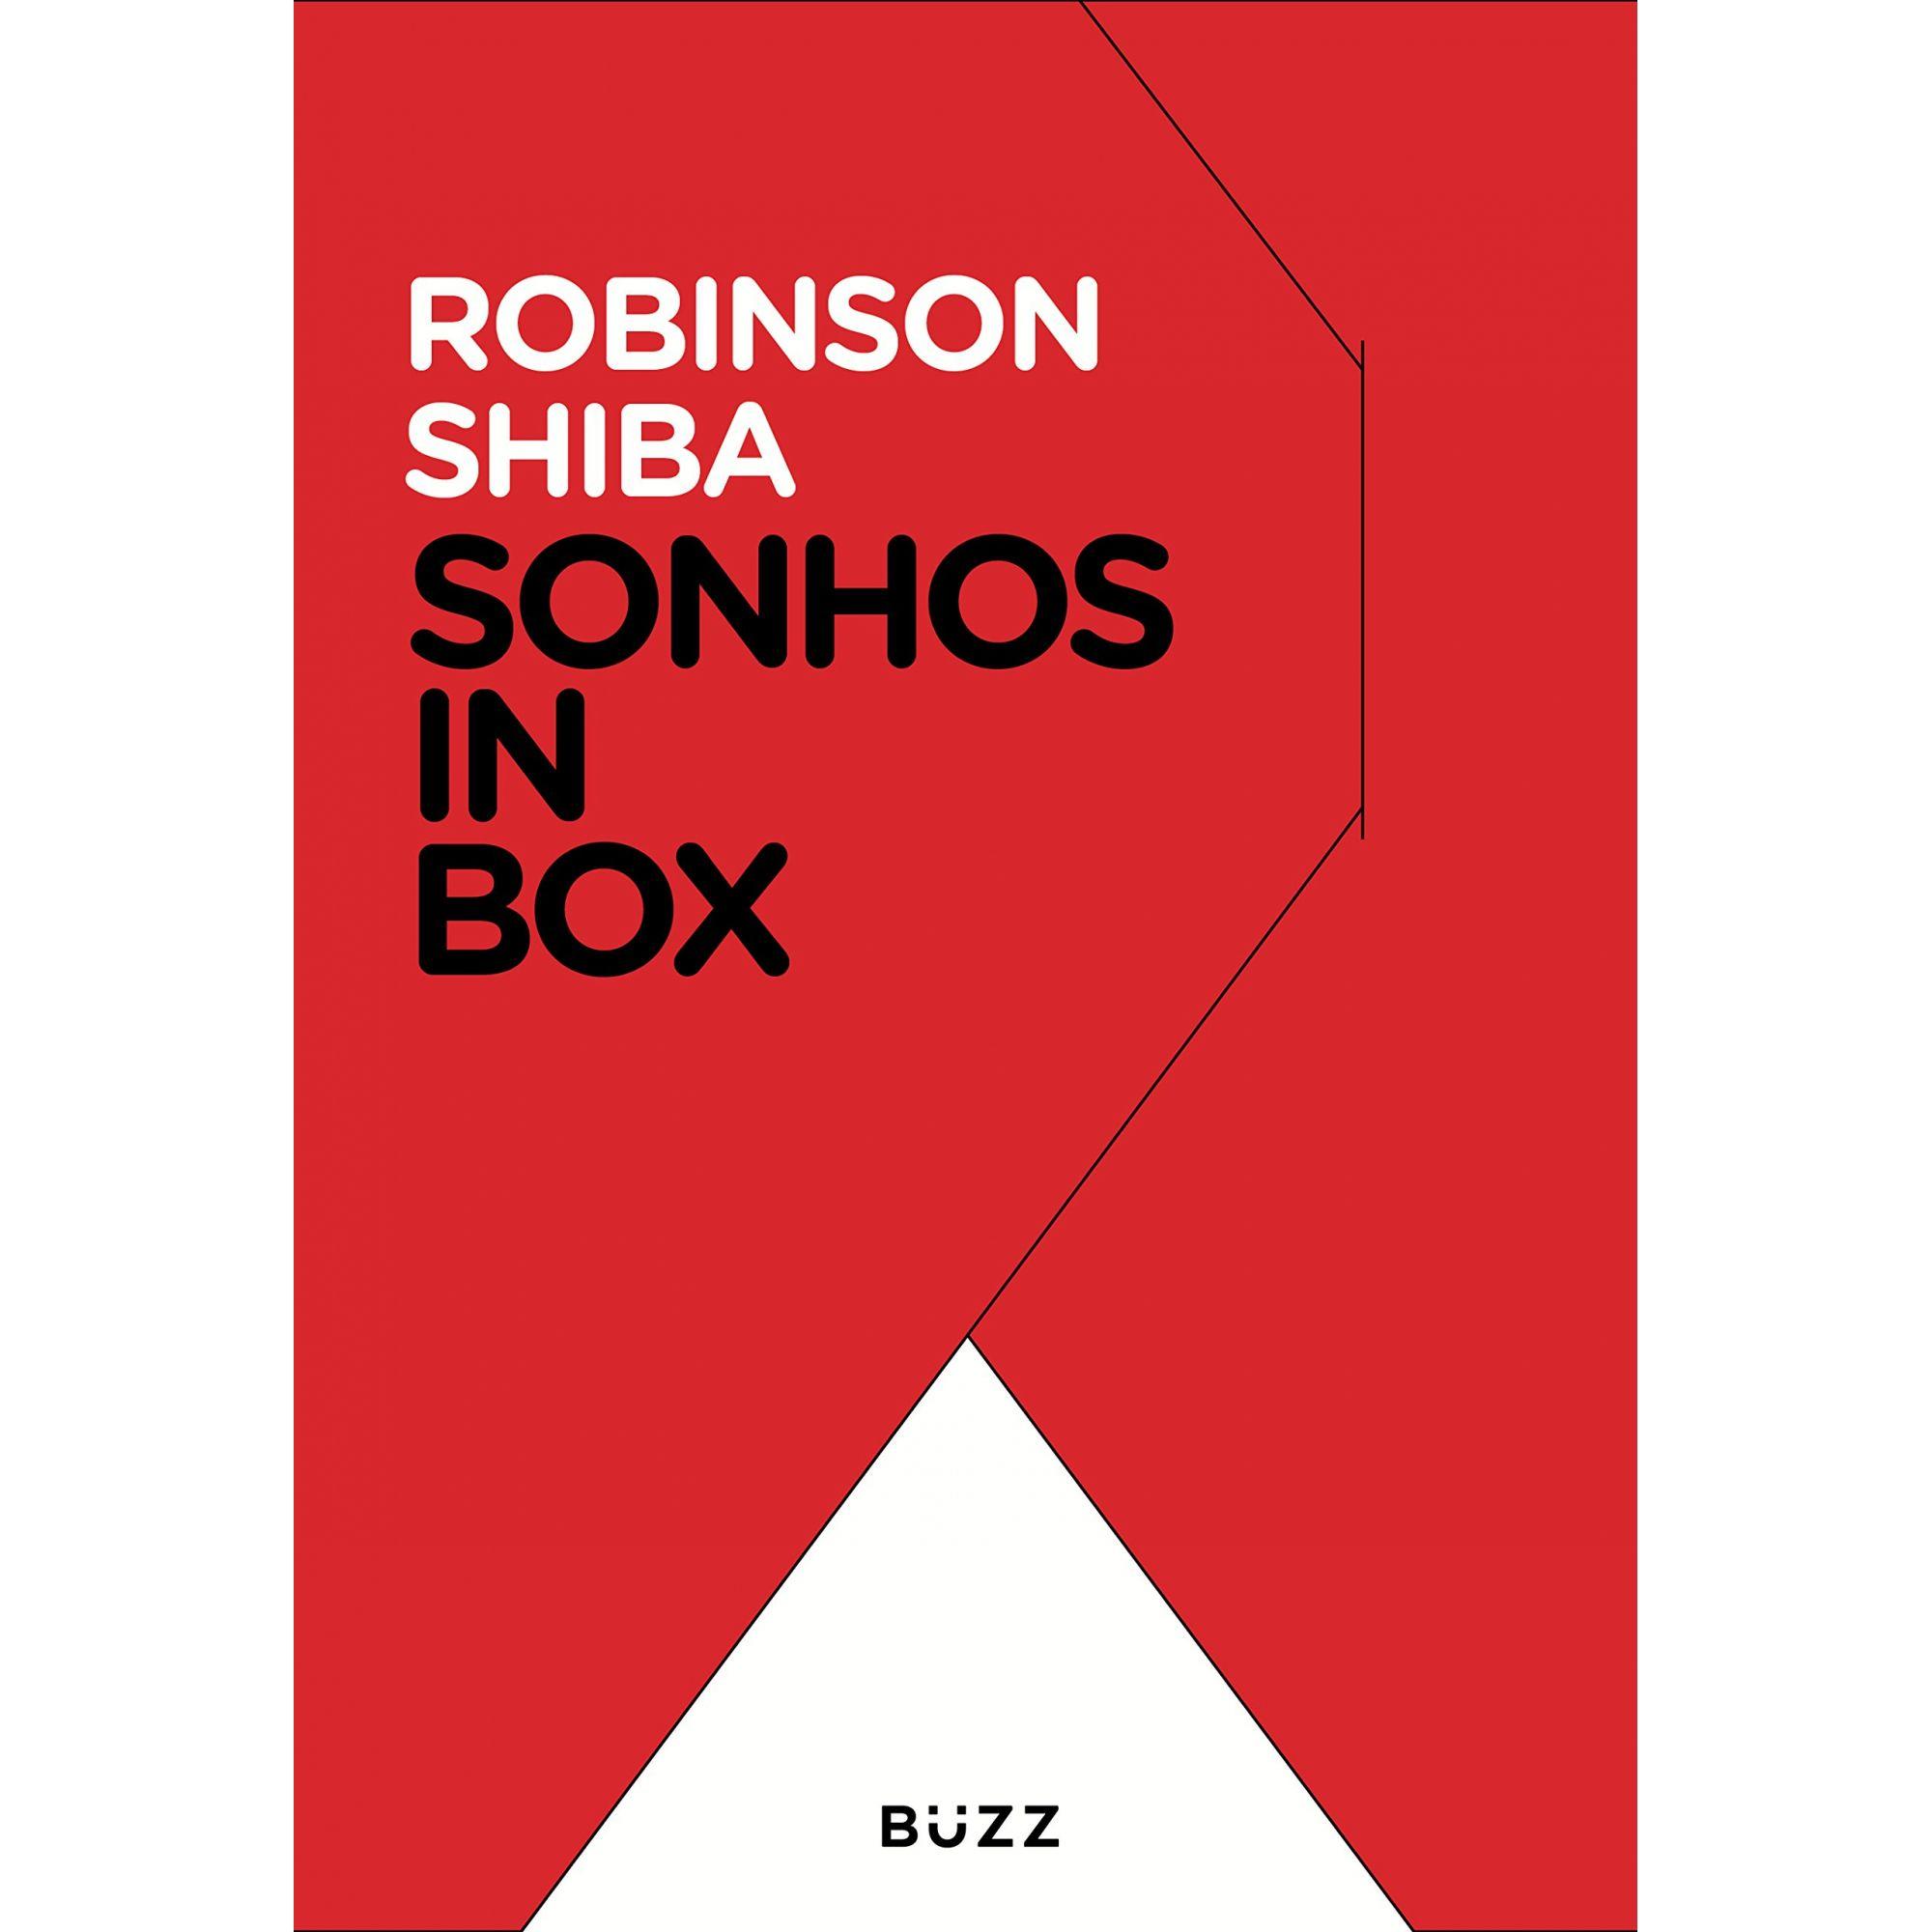 SONHOS IN BOX - BUZZ